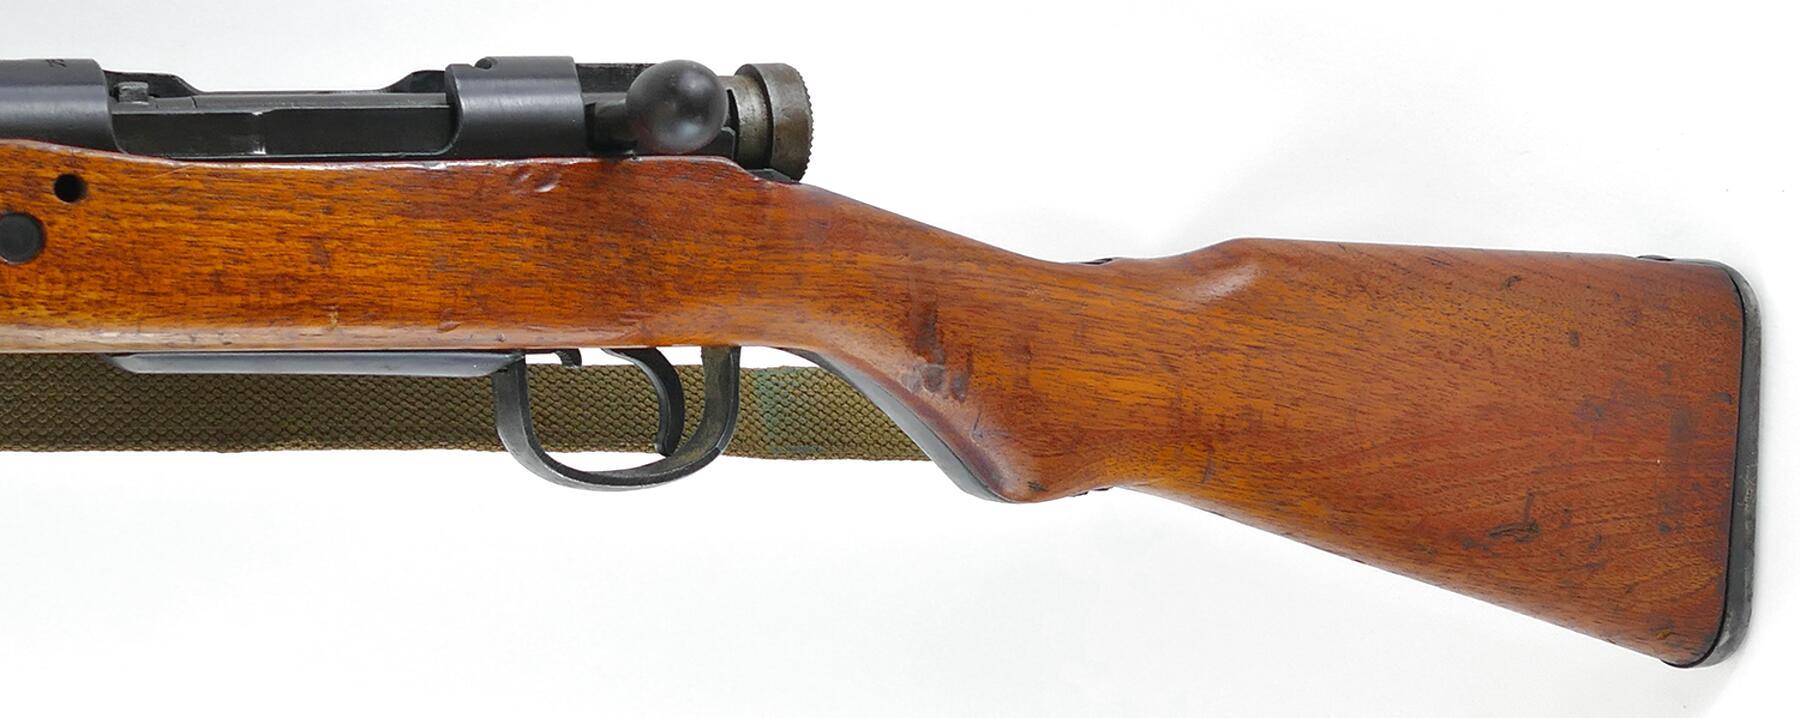 japanese arisaka rifle for sale